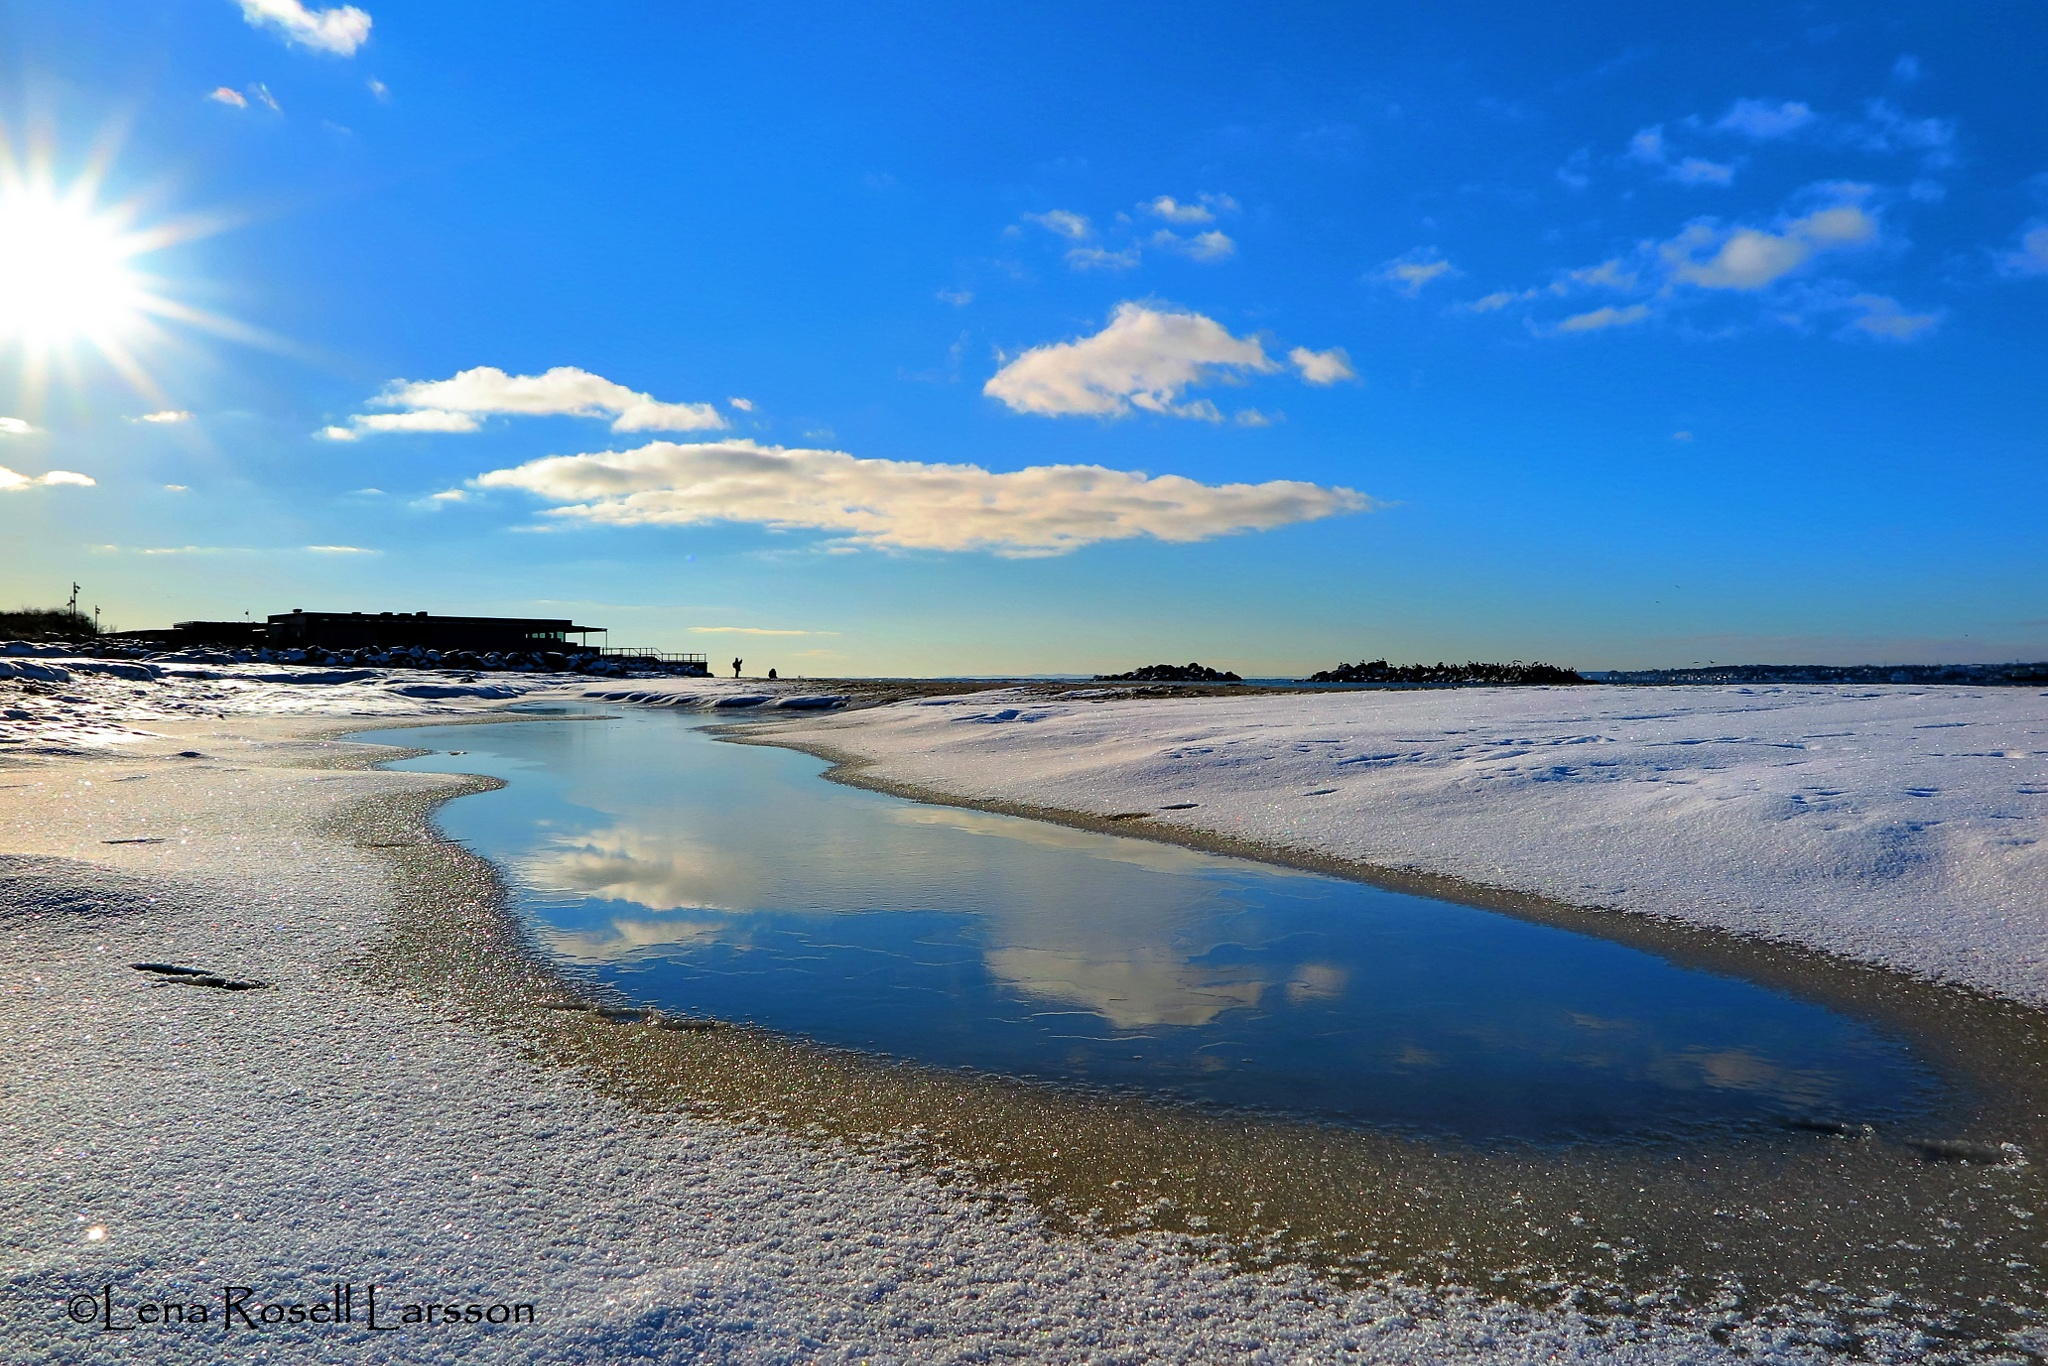 Ice-Slush by lena.roselllarsson